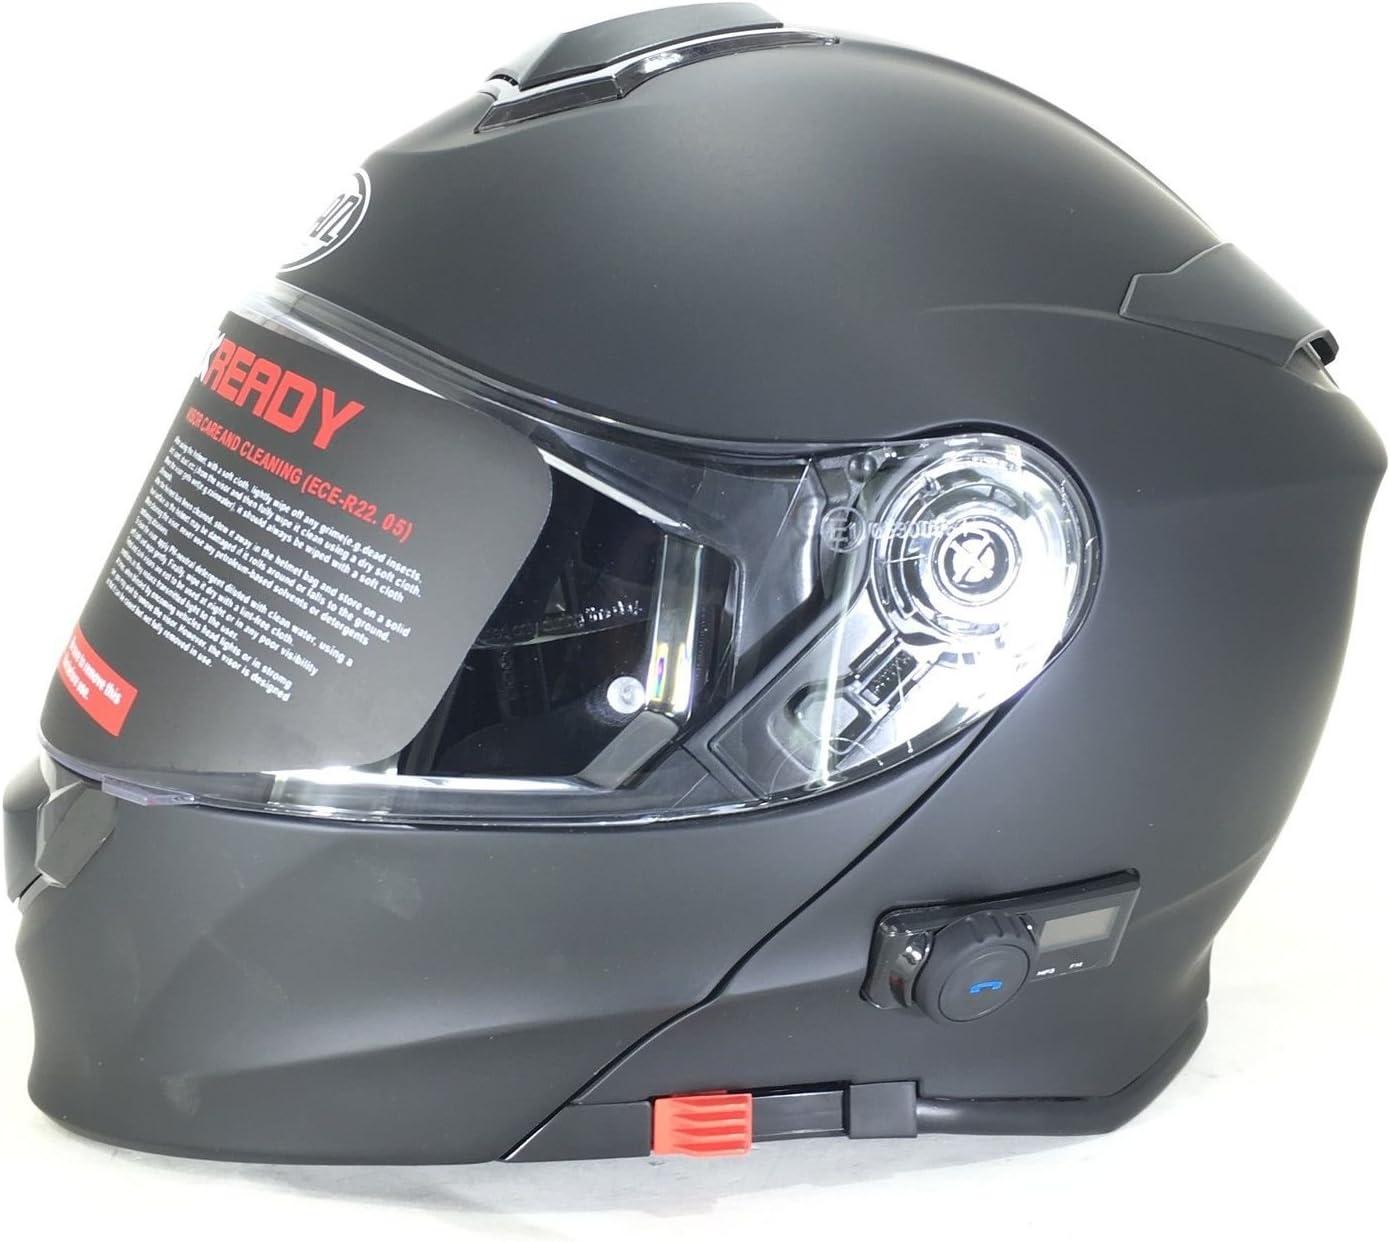 VCAN V271 BLINC BLUETOOTH FLIP FRONT HELMET New Motorbike MP3 SAT NAV FM Intercom Modular Helmet Matt Black With CARE KIT /& BALACLAVA